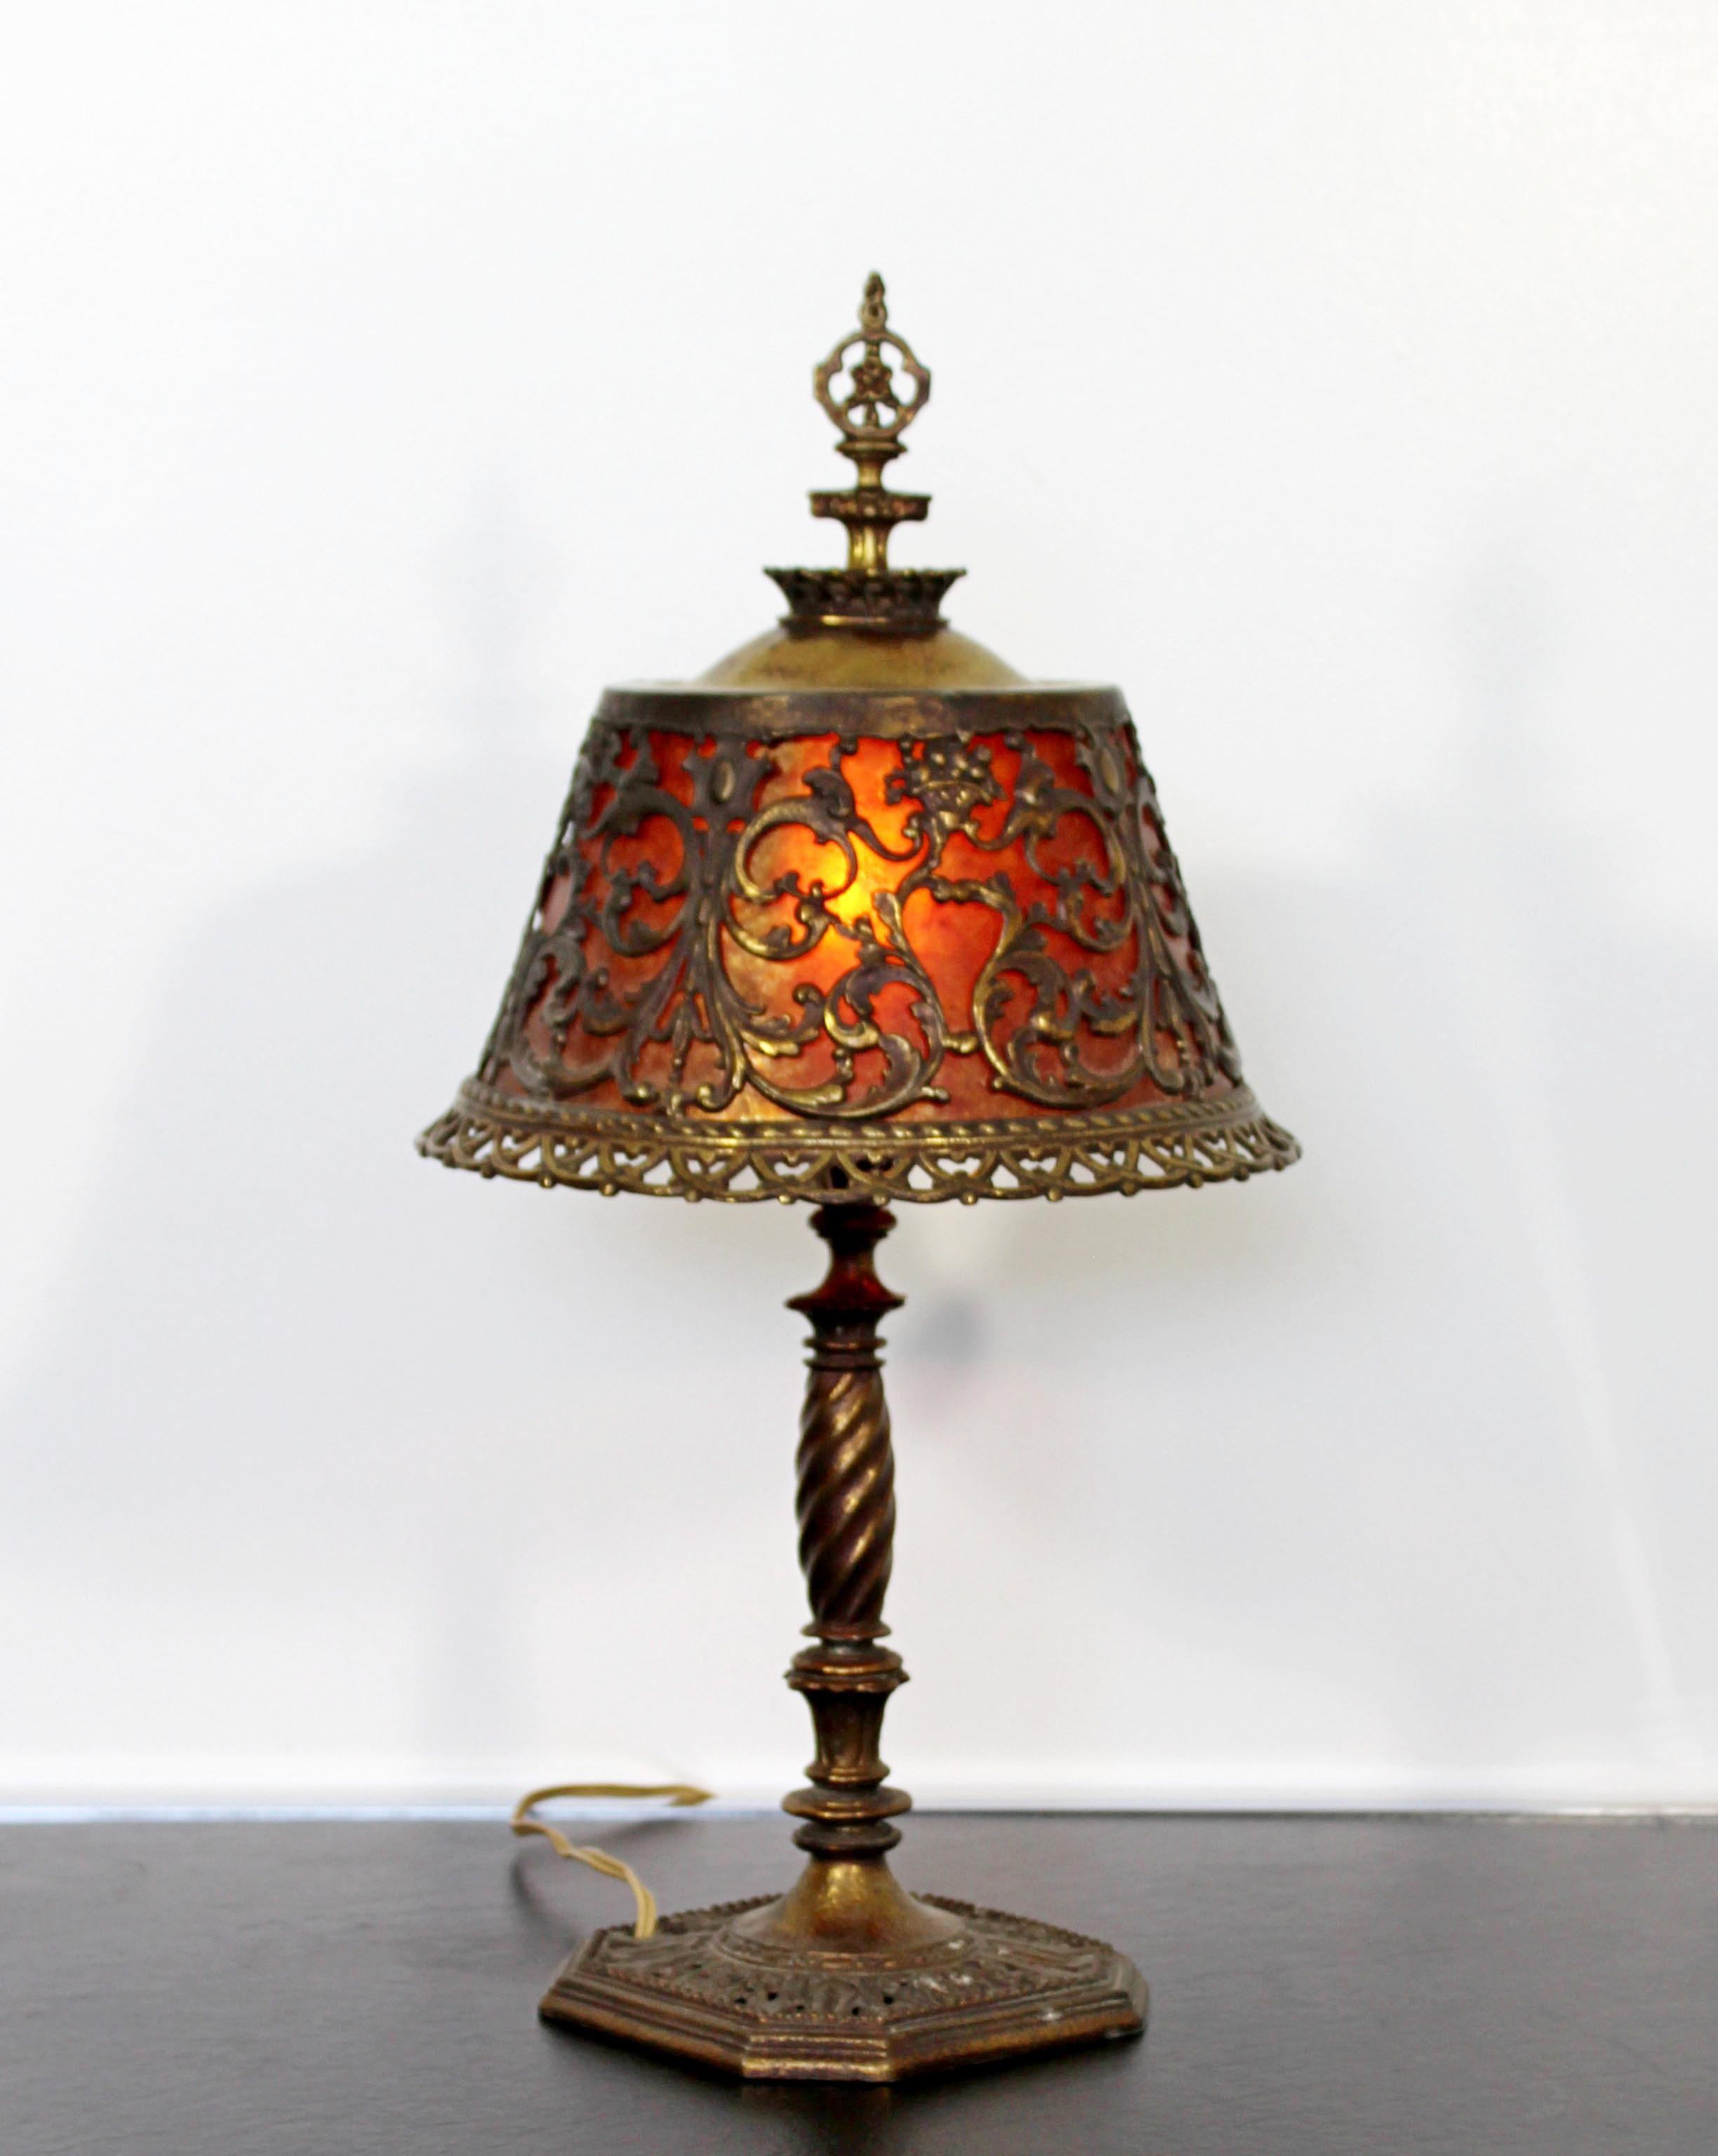 Amber Bach art deco oscar bach small bronze and amber glass ornate